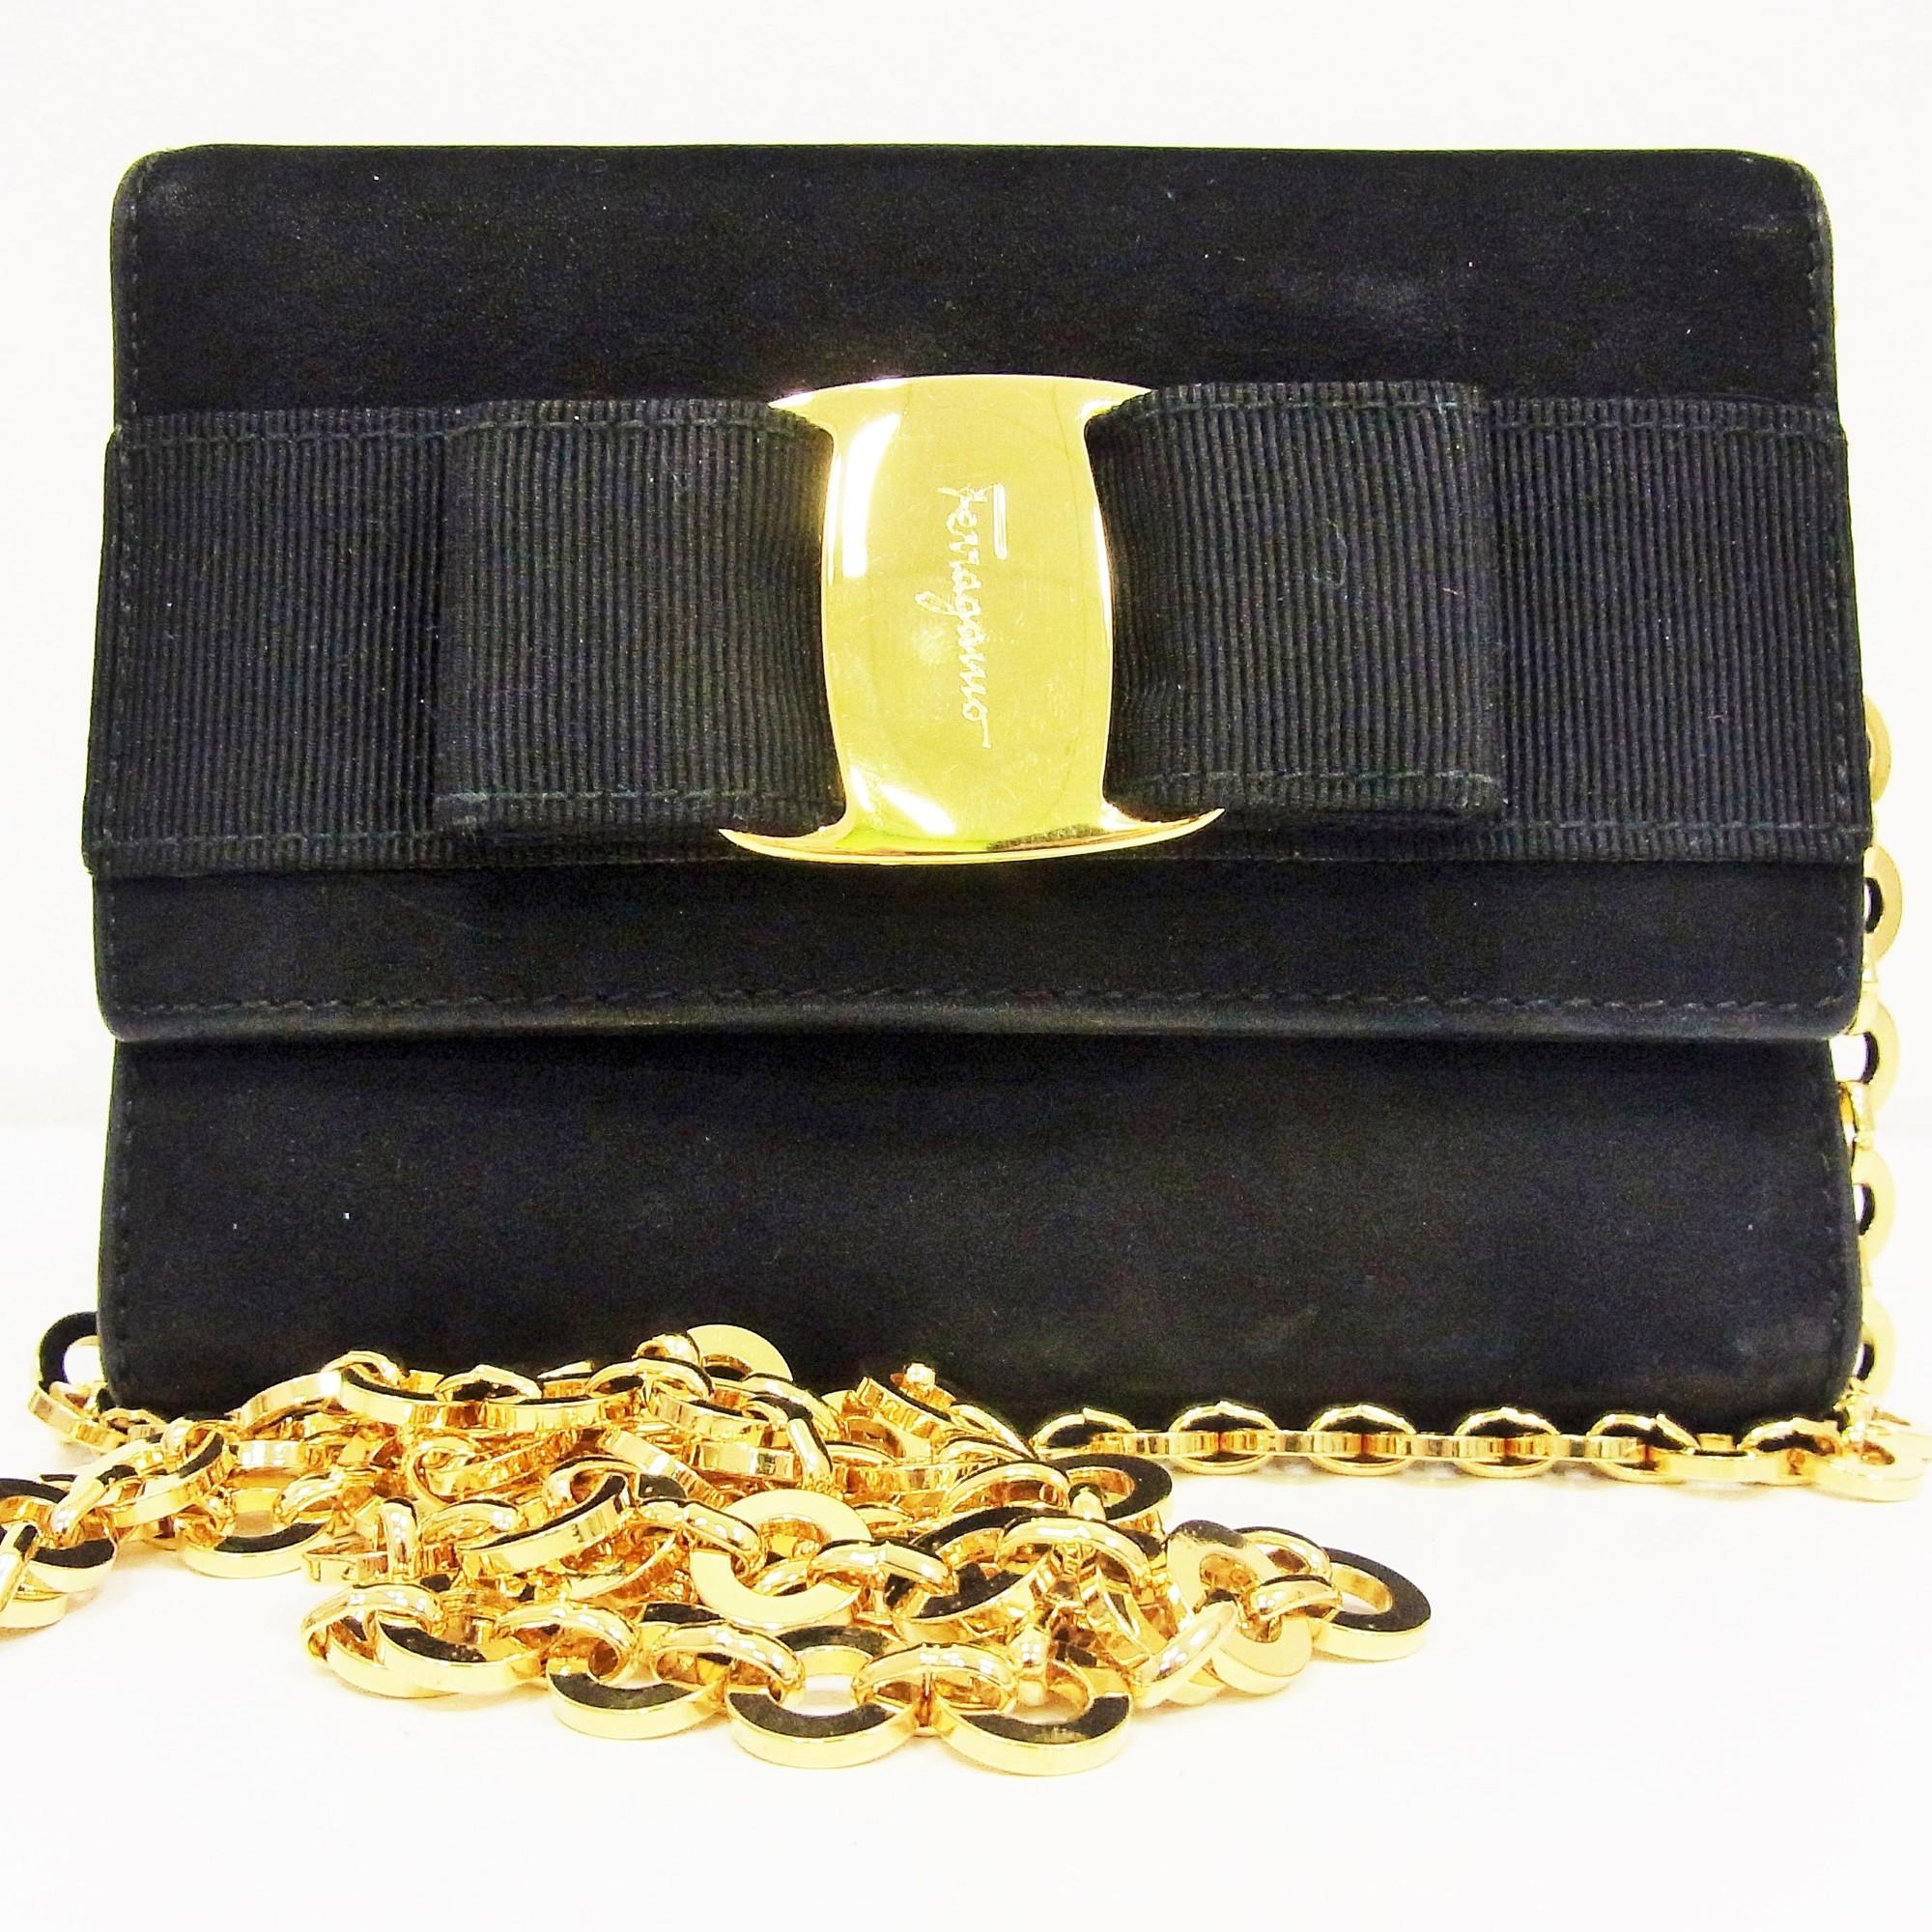 65d77d9a79f9 Auth Salvatore Ferragamo Vara Bow 2way Gold Chain Mini Women s Suede ...